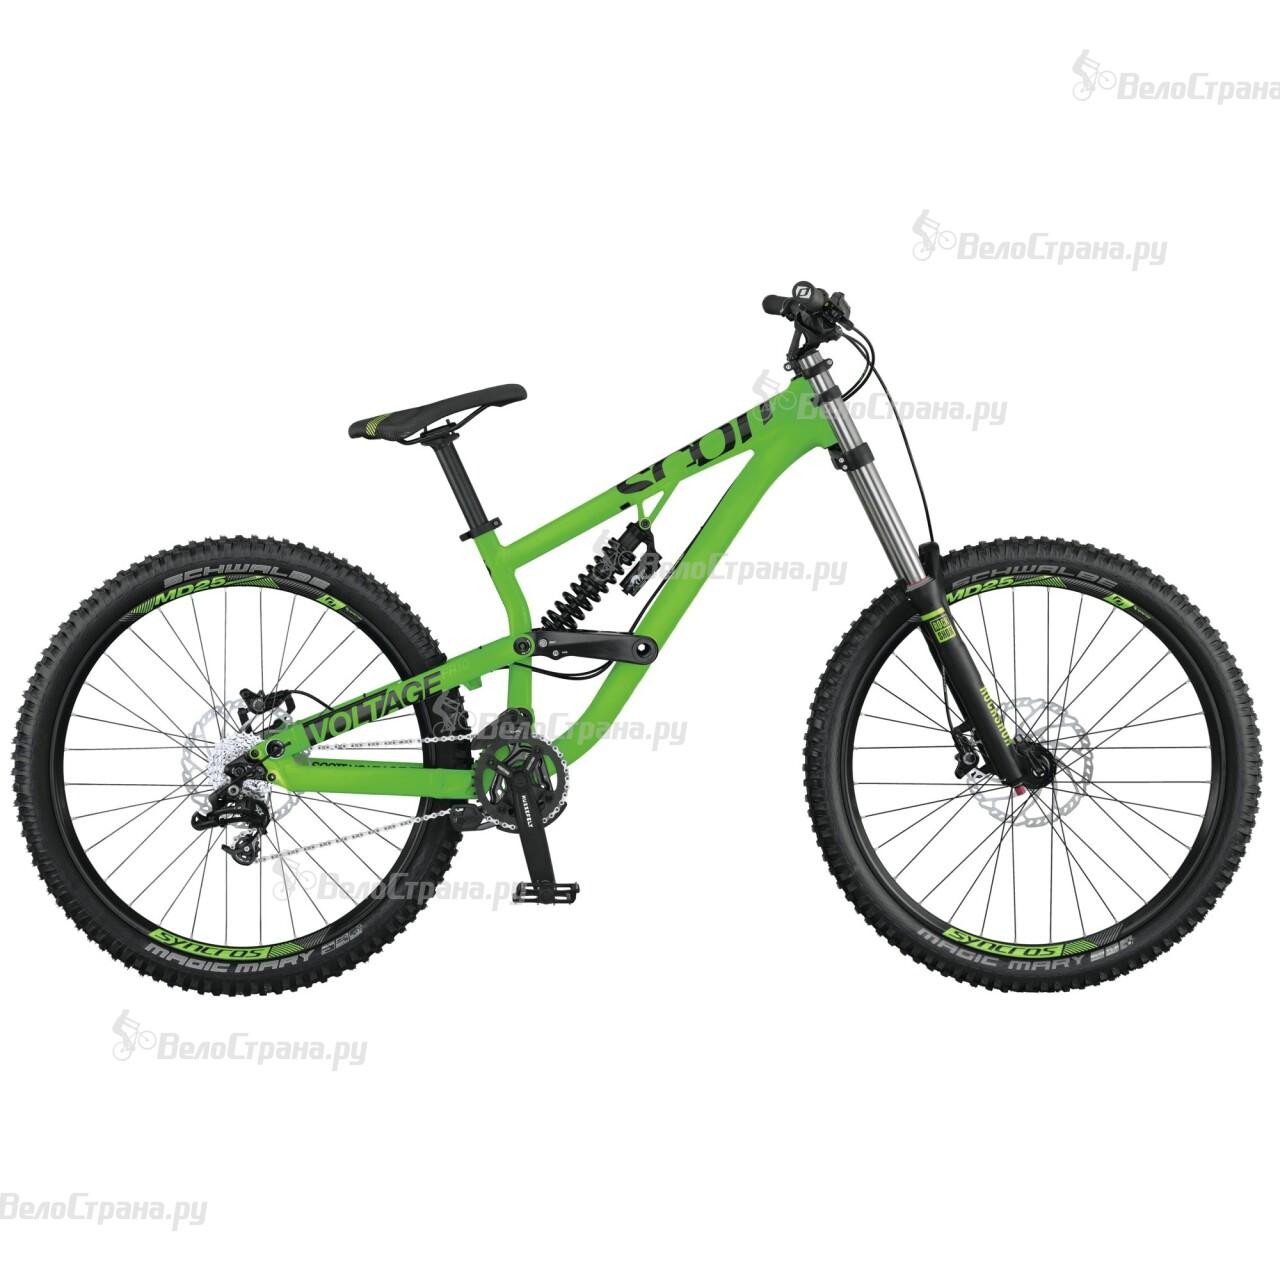 Велосипед Scott Voltage FR 720 (2015)